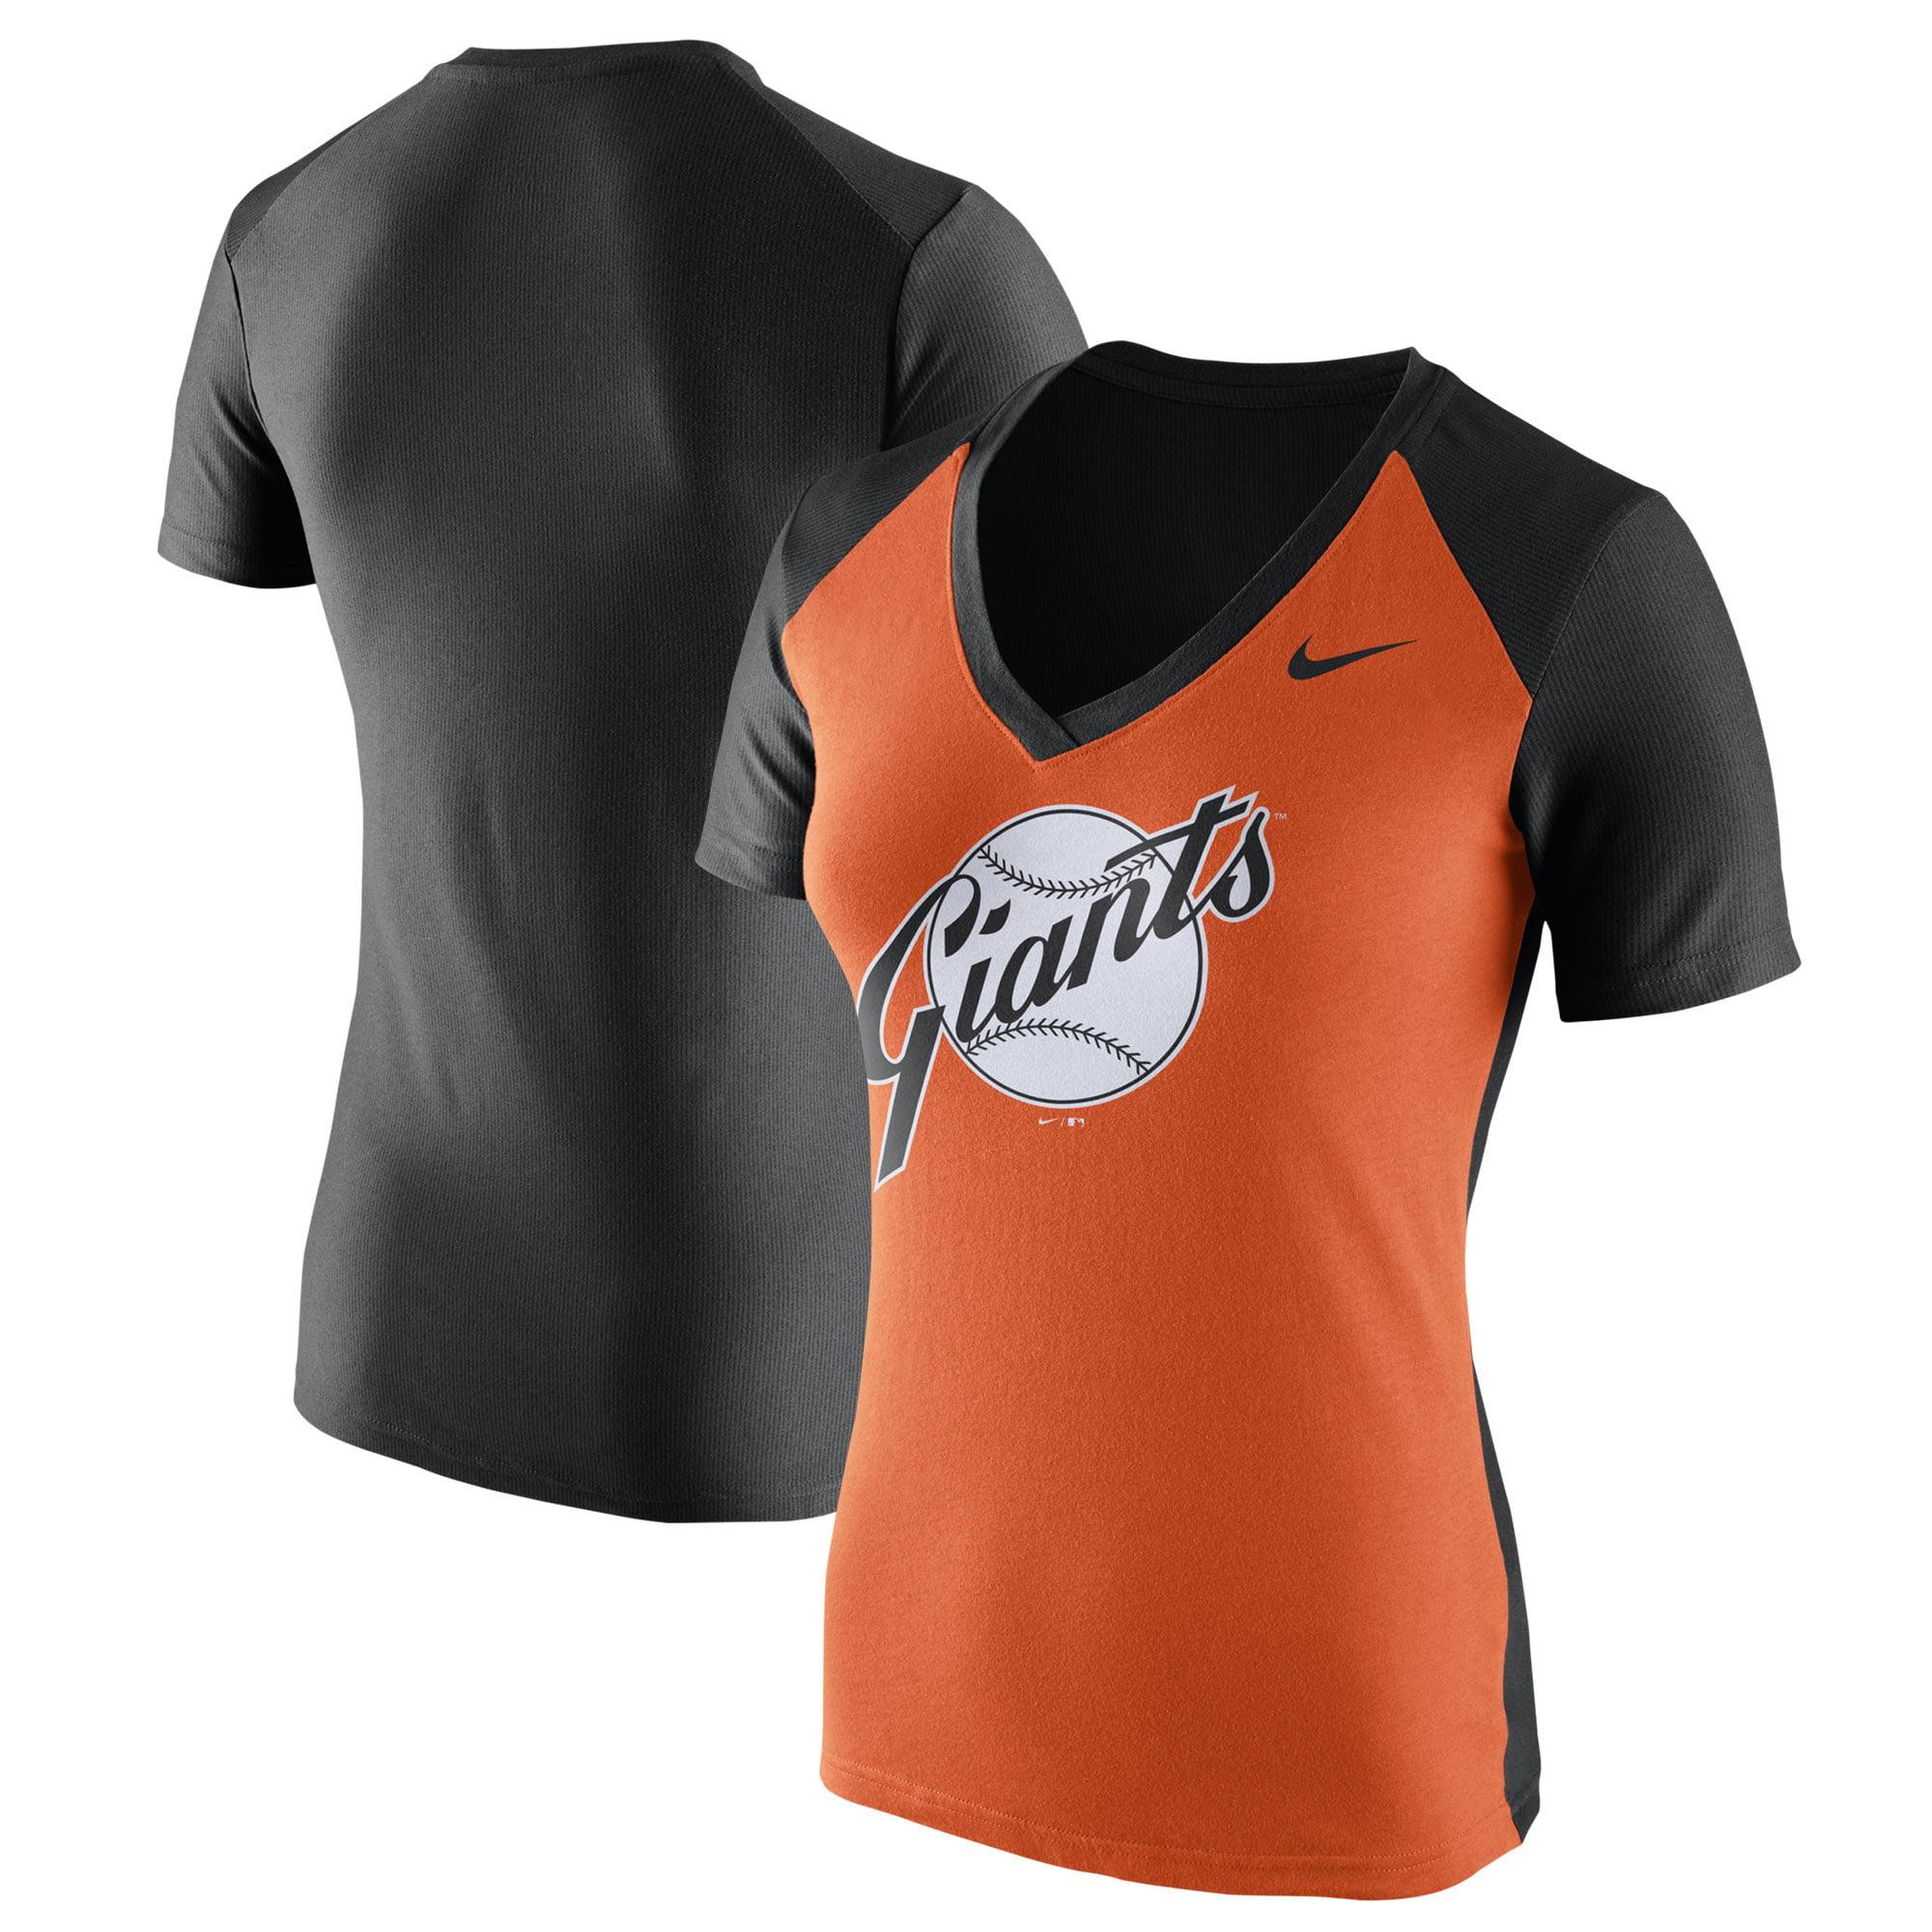 San Francisco Giants Nike Women's Cooperstown Collection Throwback Logo V-Neck T-Shirt - Orange